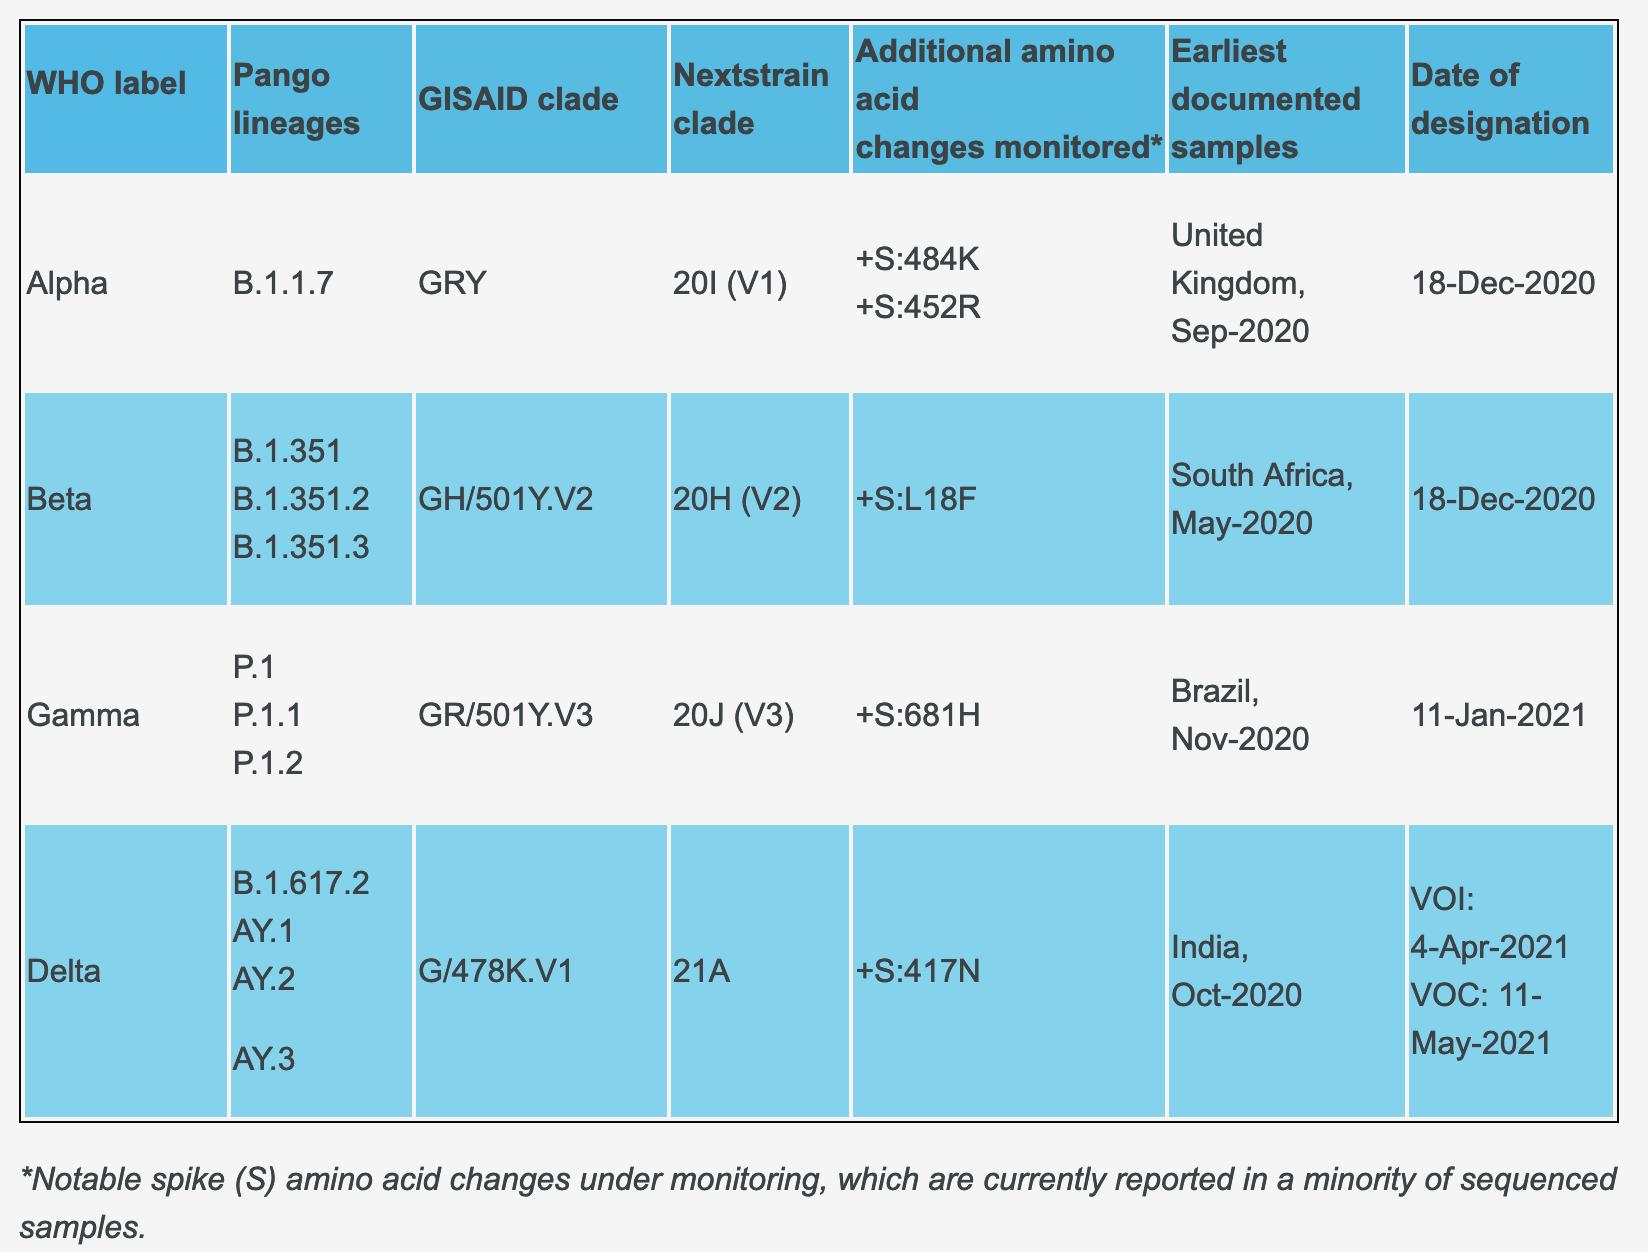 Screenshot of WHO: Variants of Concern SARS-CoV-2